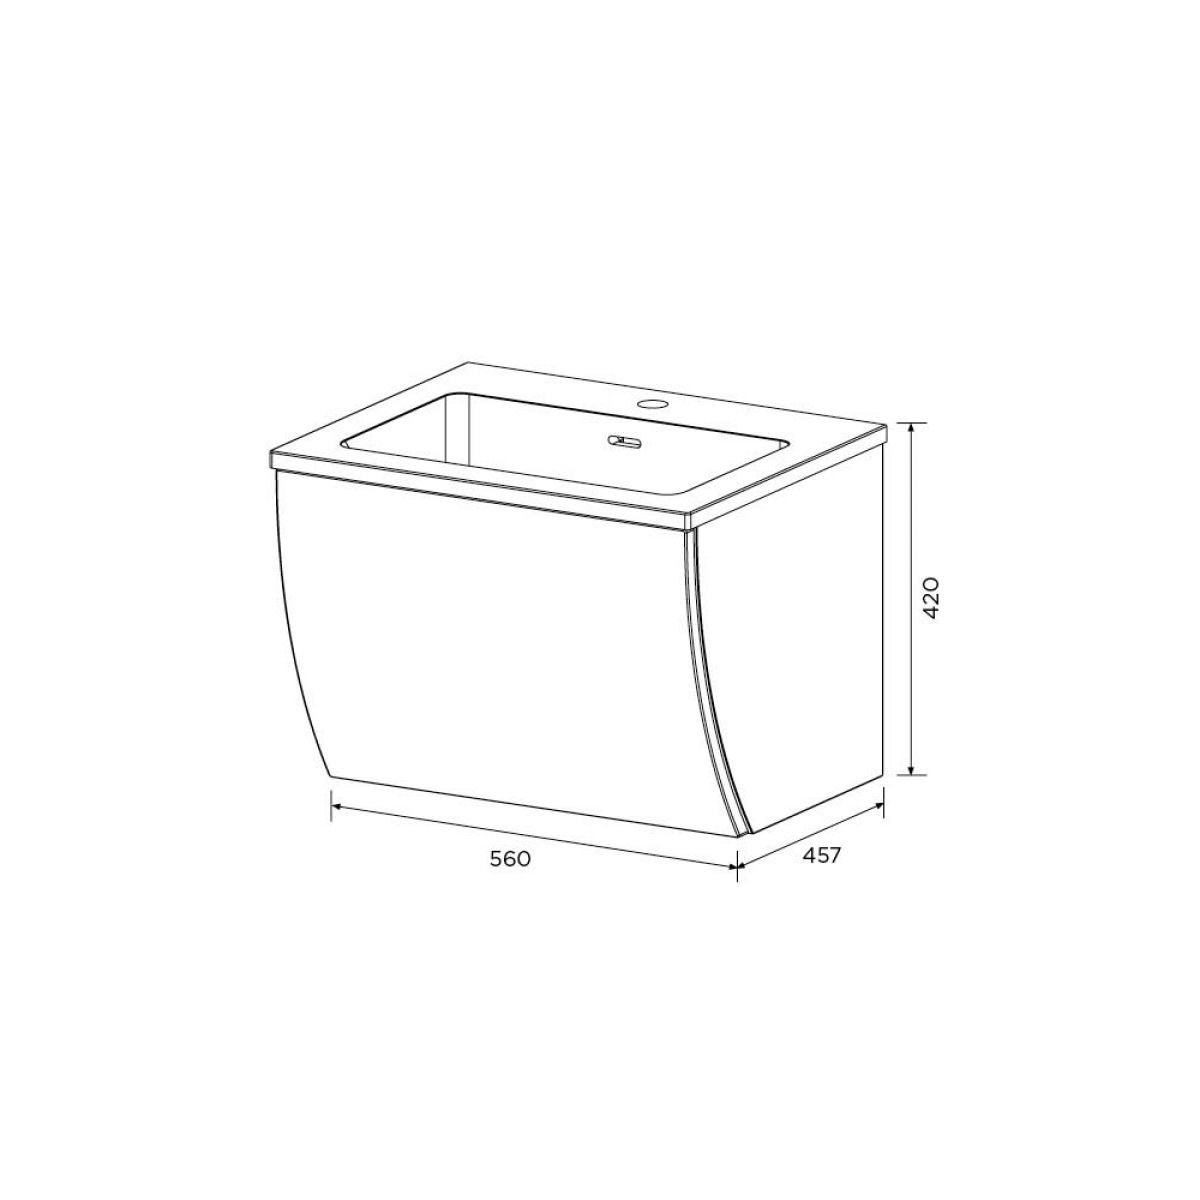 Elation Kiyo Pearl Grey Gloss Vanity Unit 550mm Dimensions